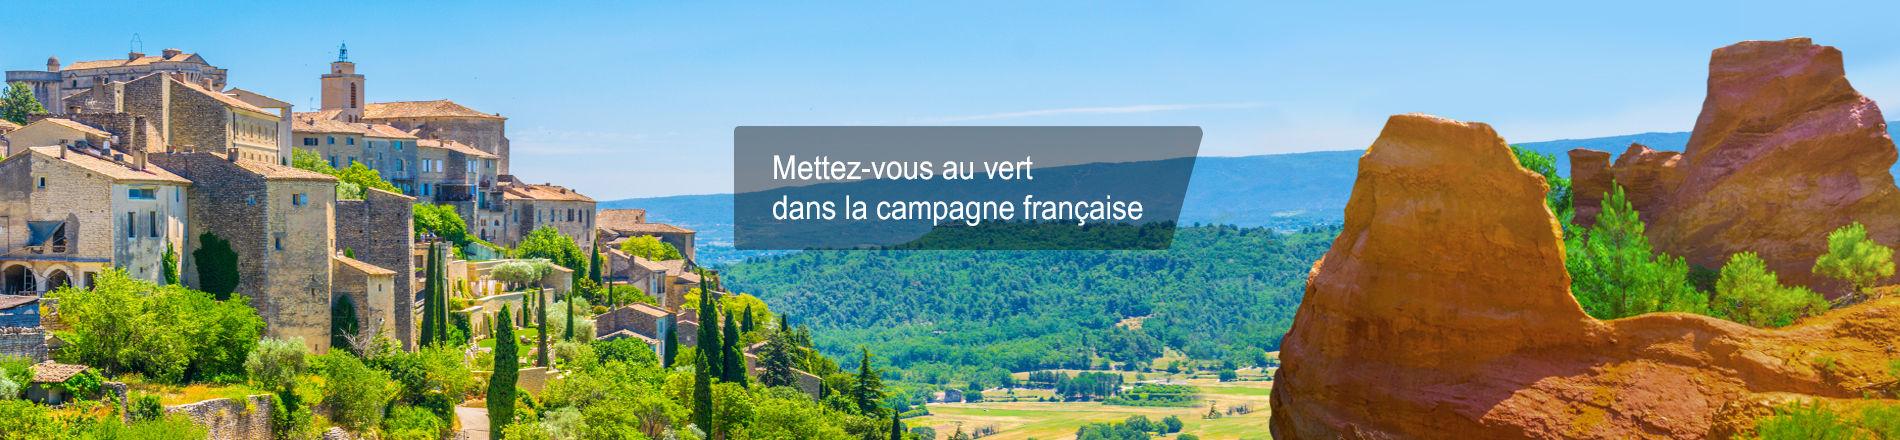 Week-ends, séjours et locations en France